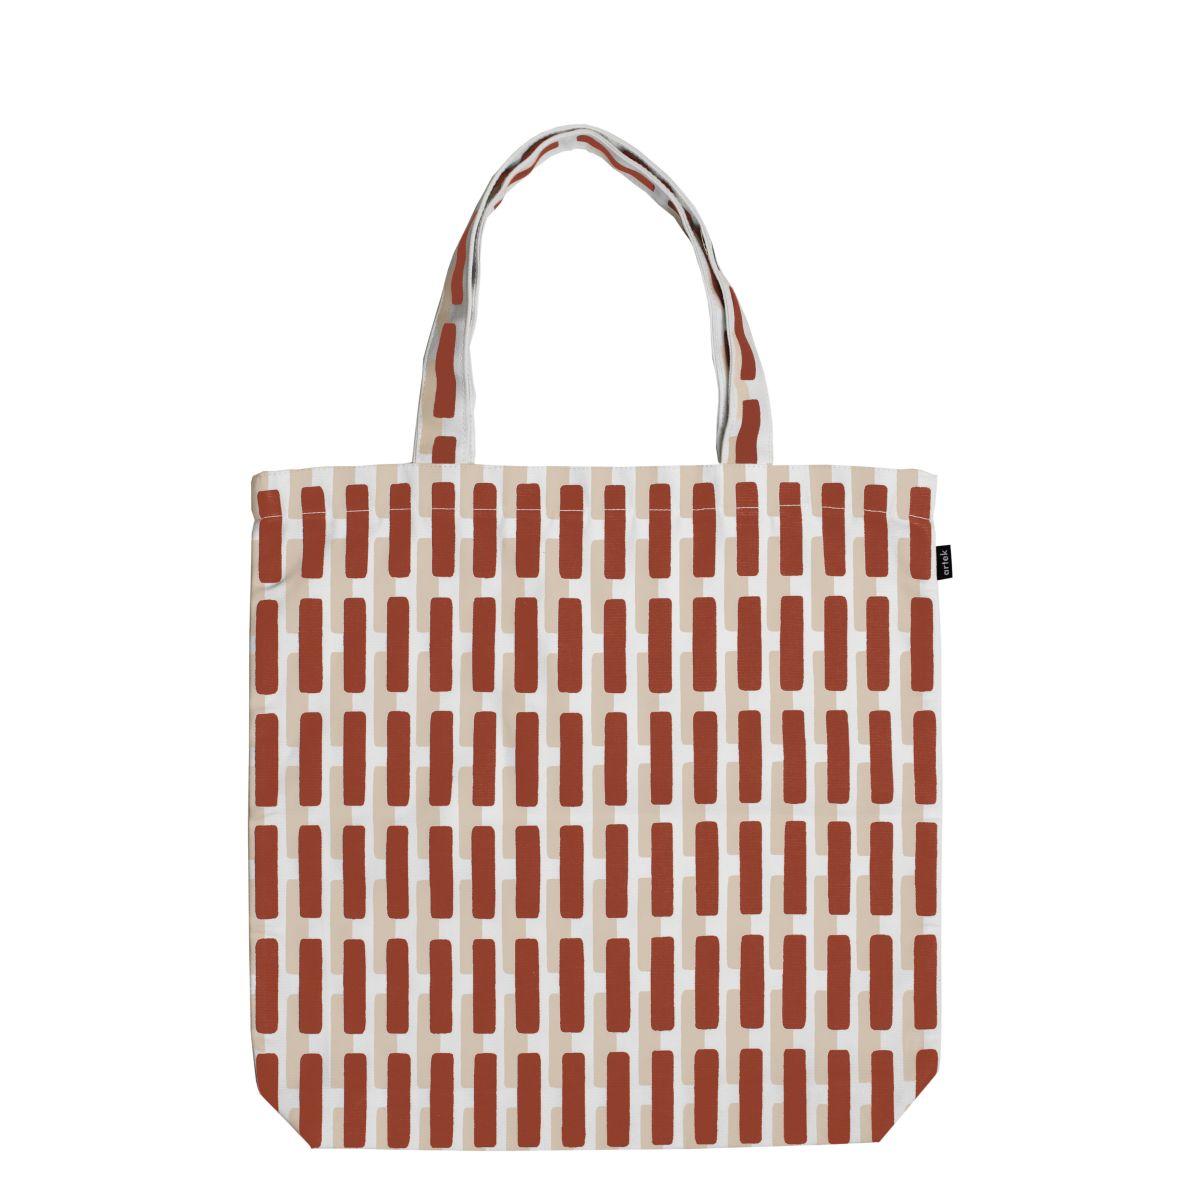 Siena-Canvas-Bag-brick-sand-shadow-3976600